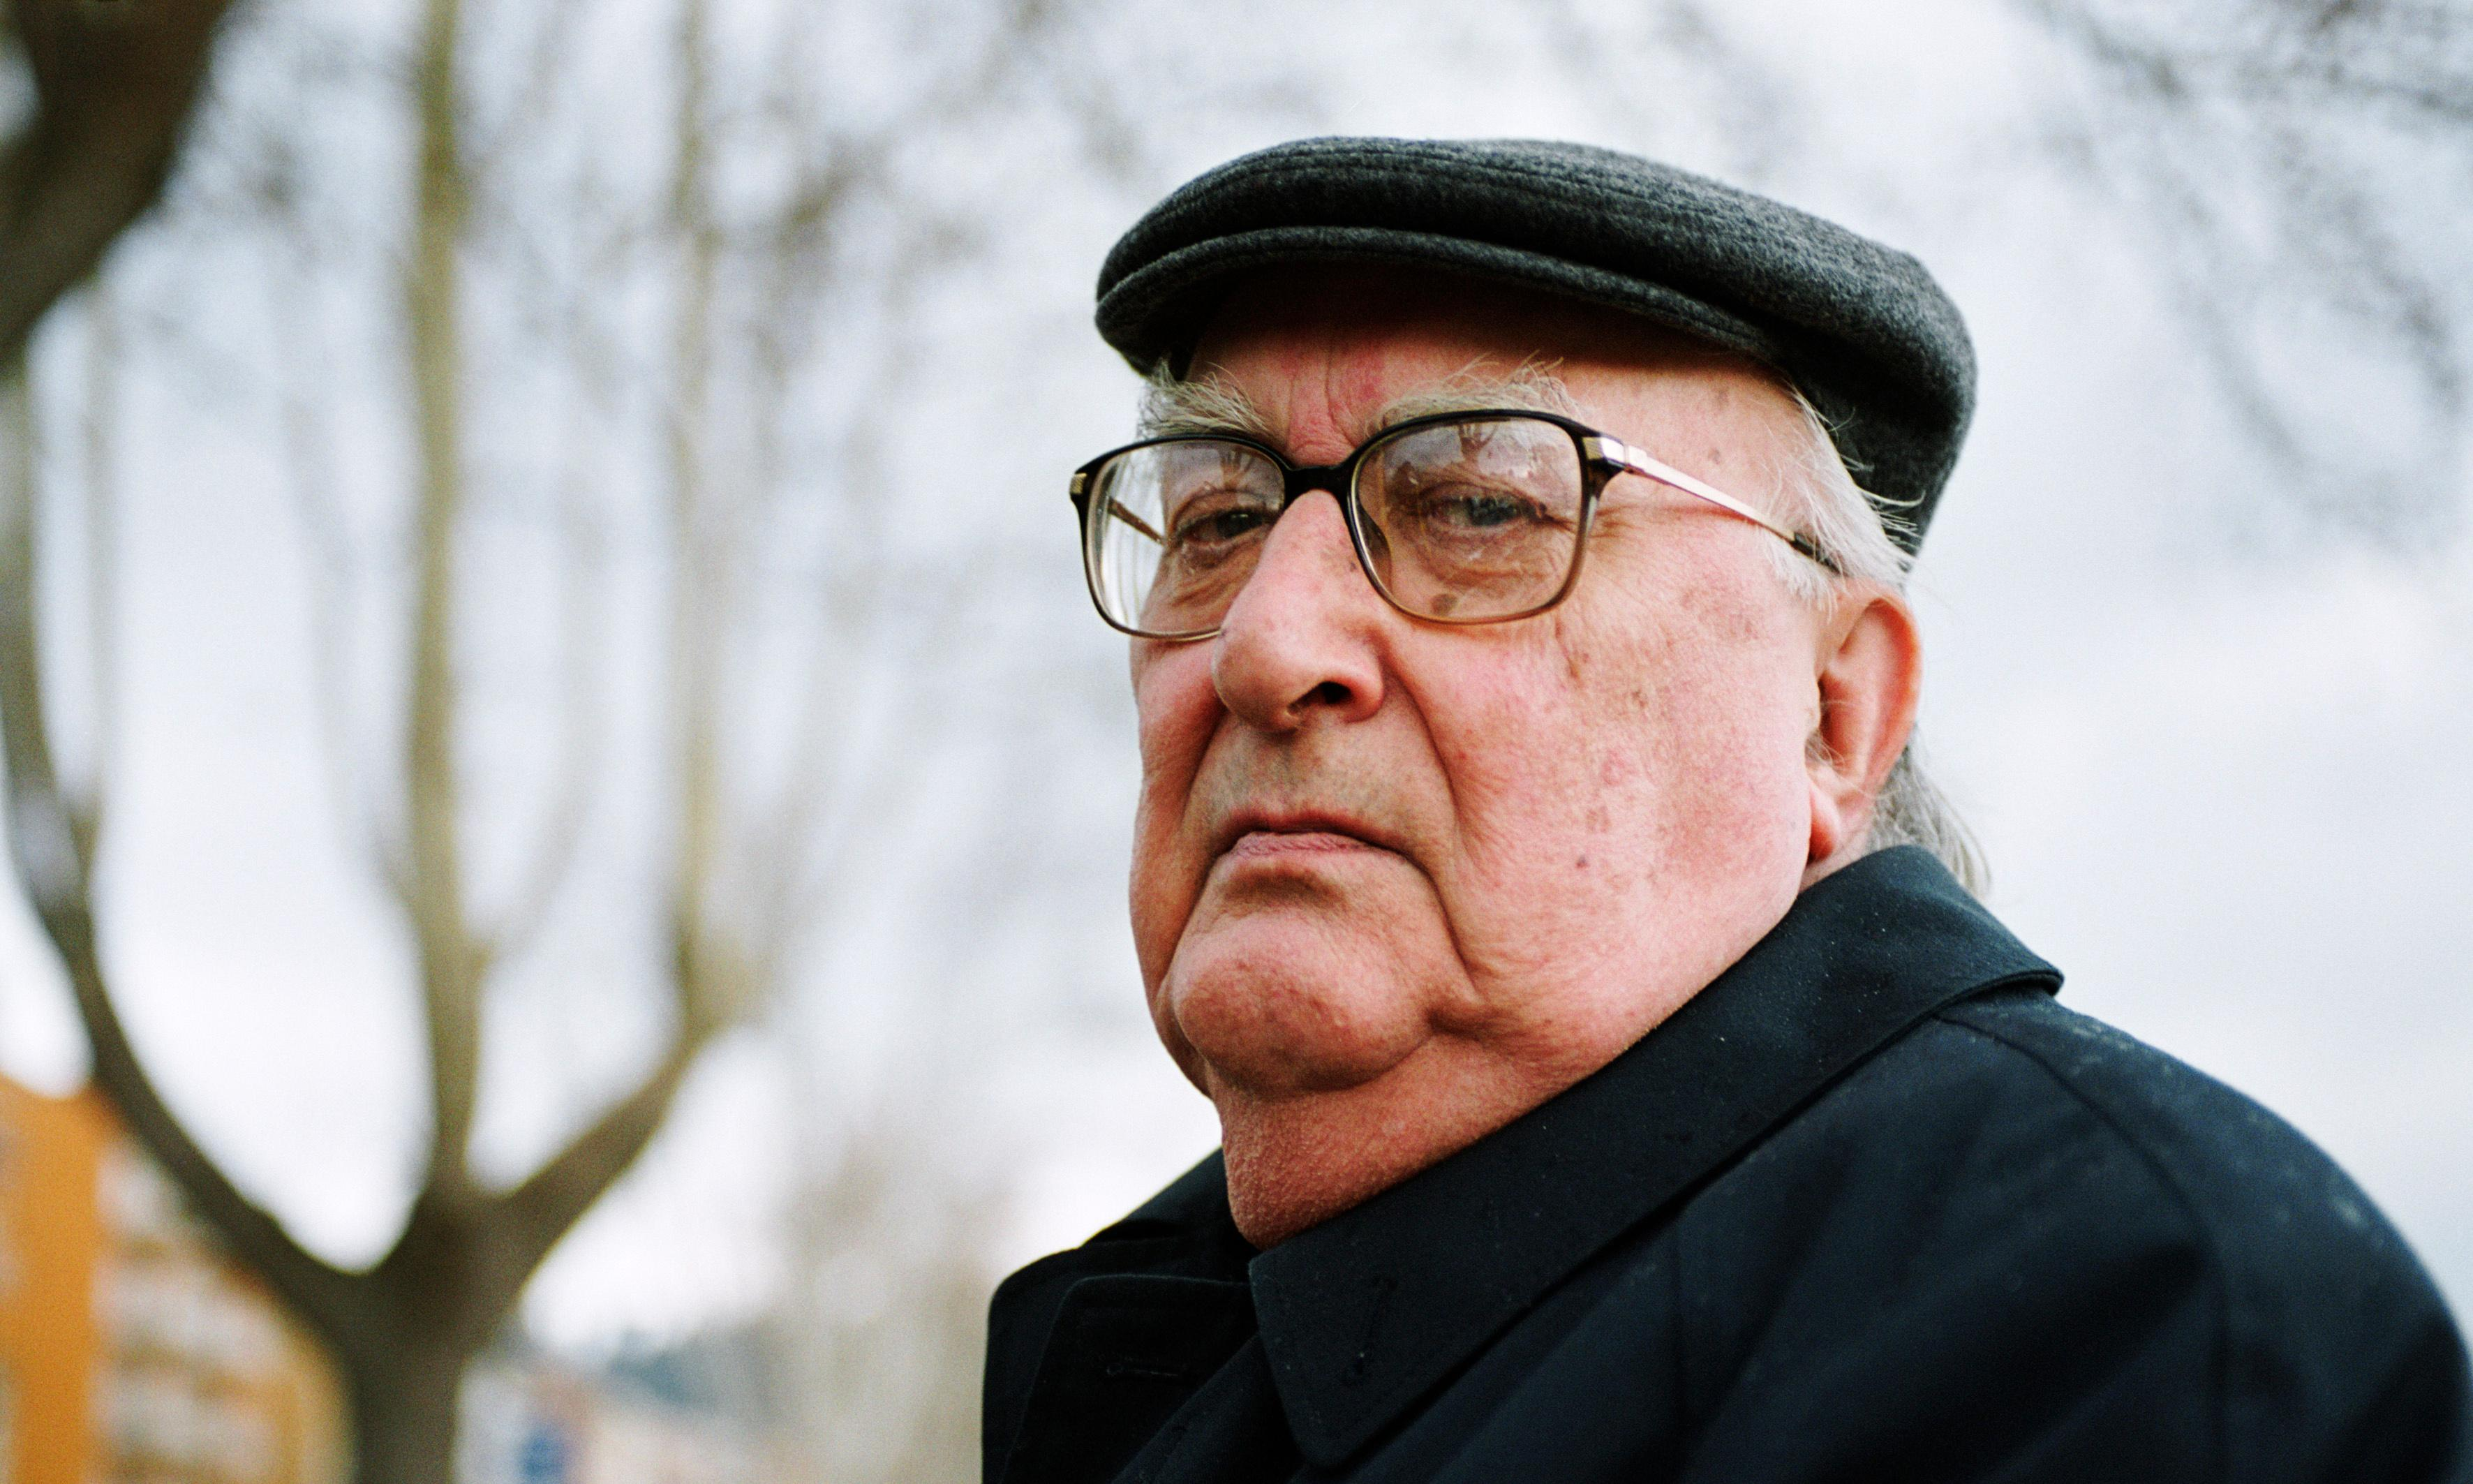 Andrea Camilleri, beloved creator of Inspector Montalbano, dies aged 93